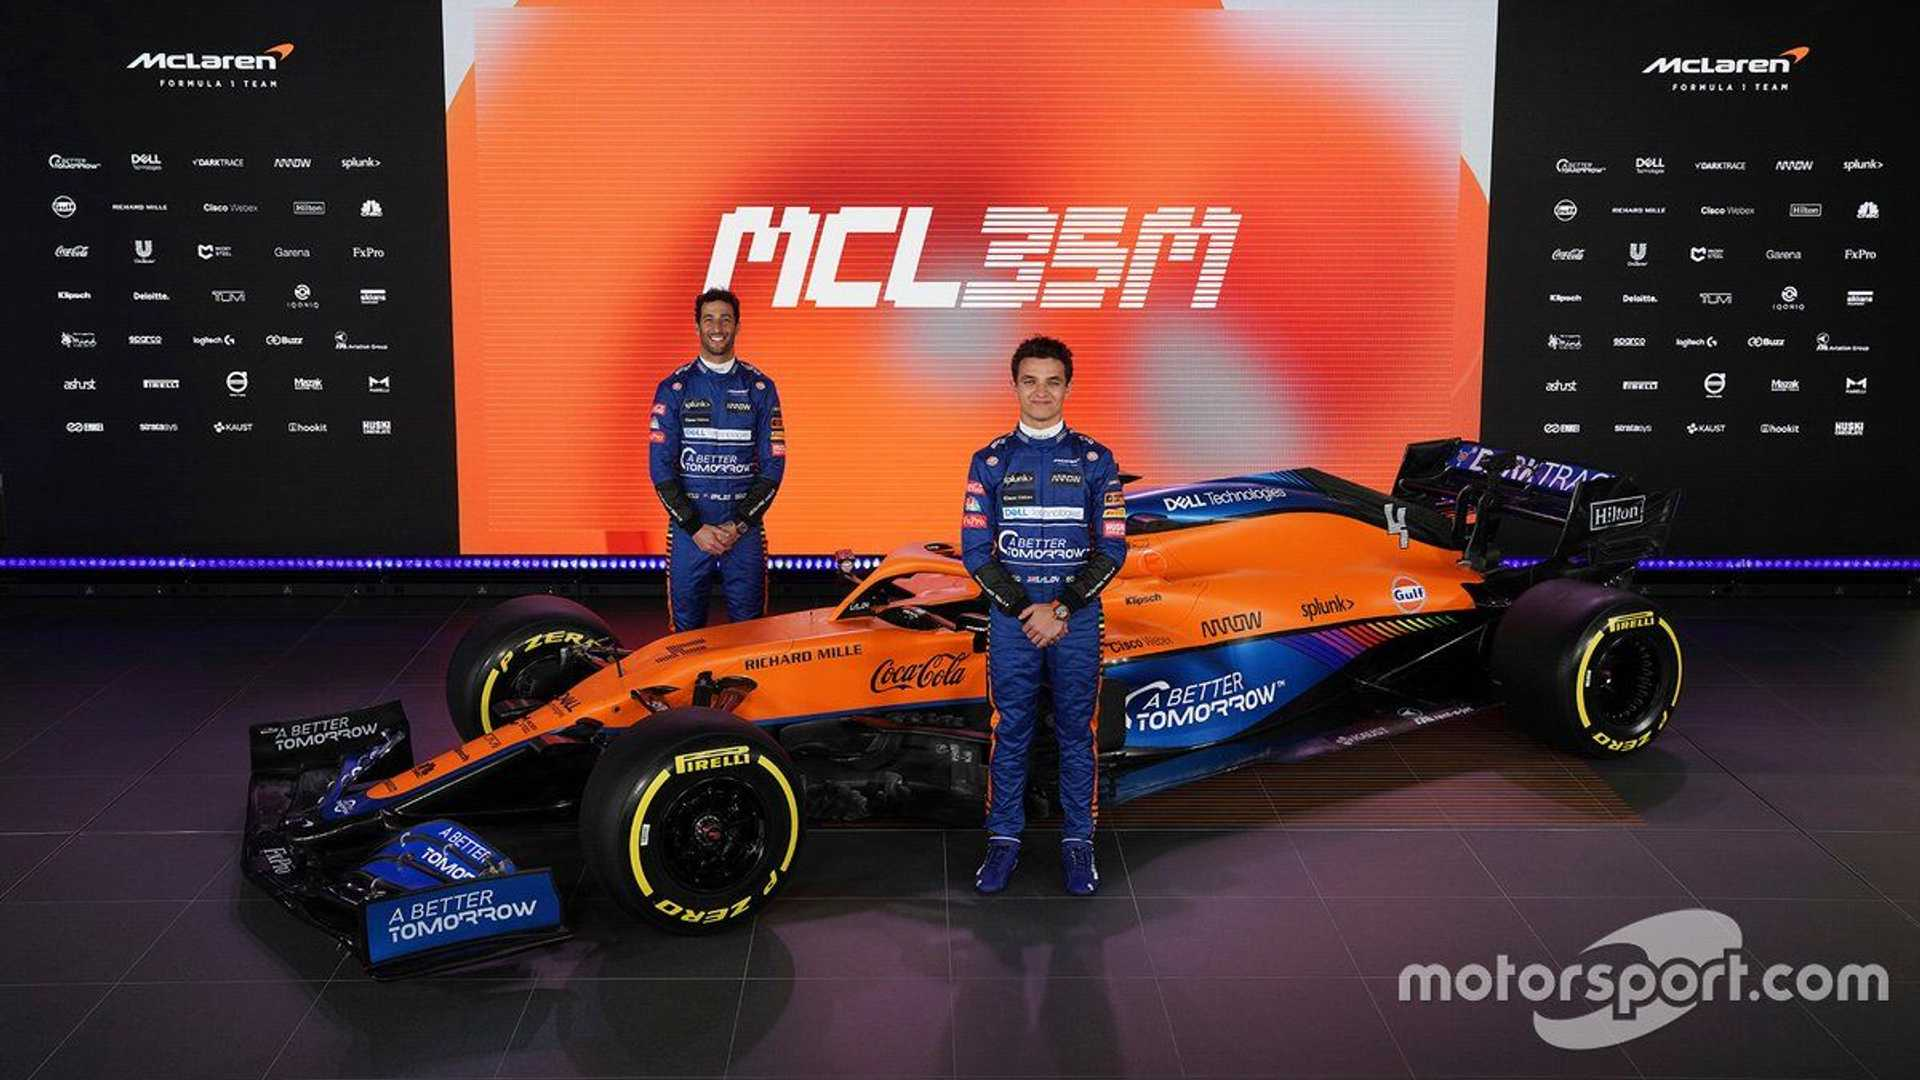 Daniel Ricciardo and Lando Norris at McLaren MCL35M presentation